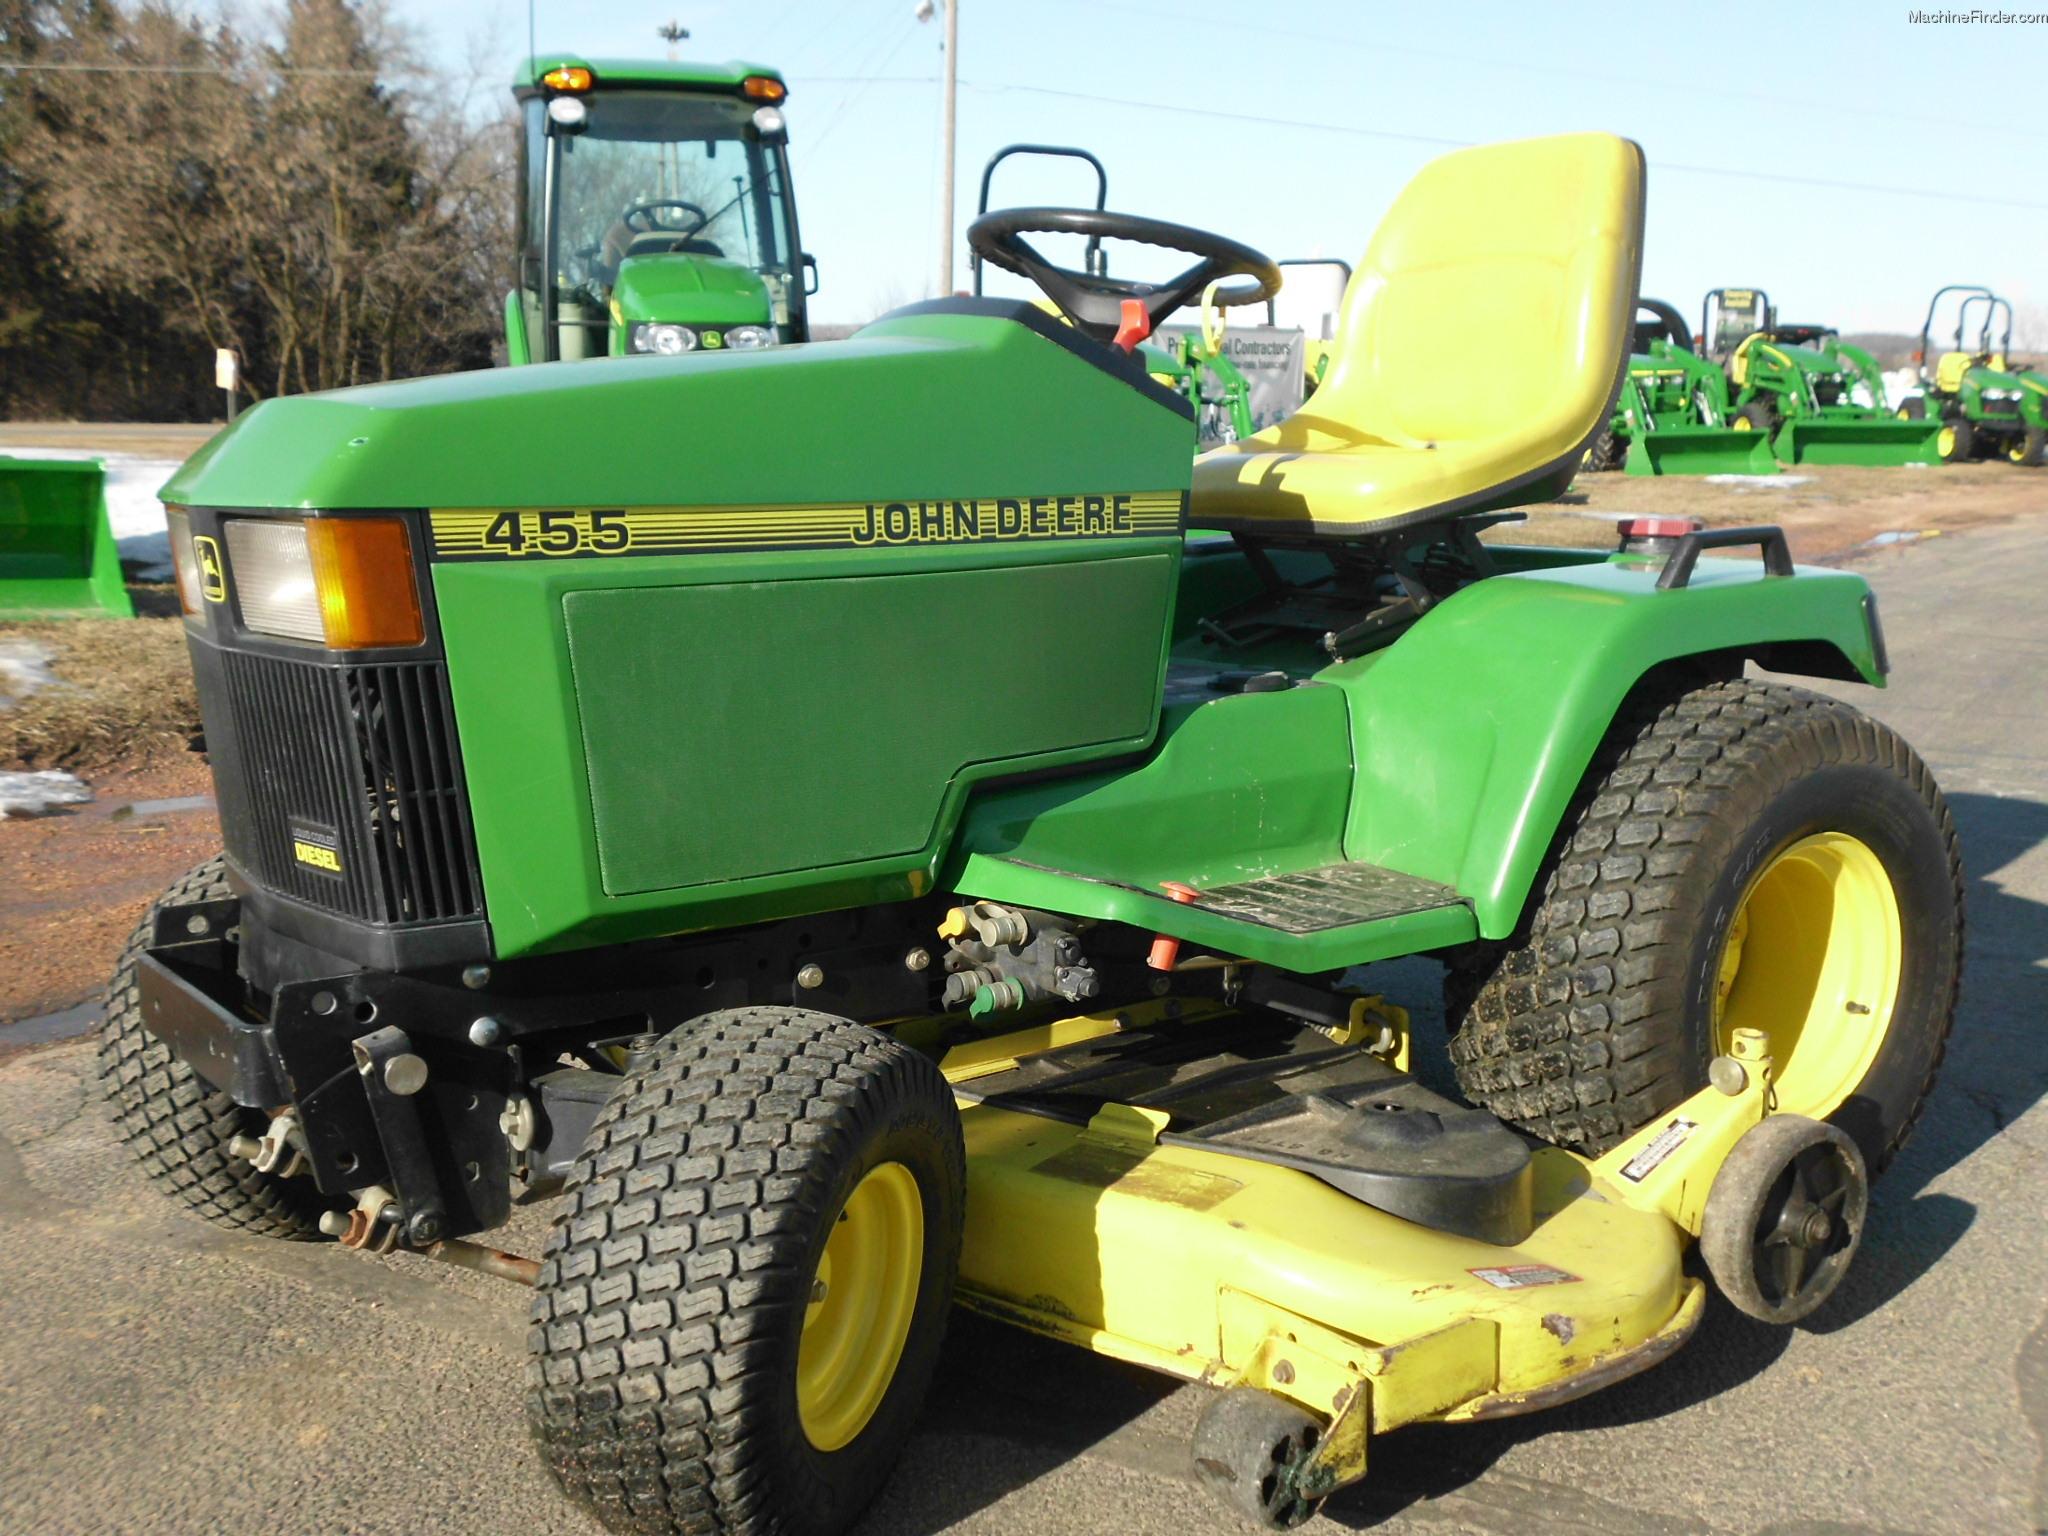 John Deere 455 Mower Parts : Used farm agricultural equipment john deere machinefinder